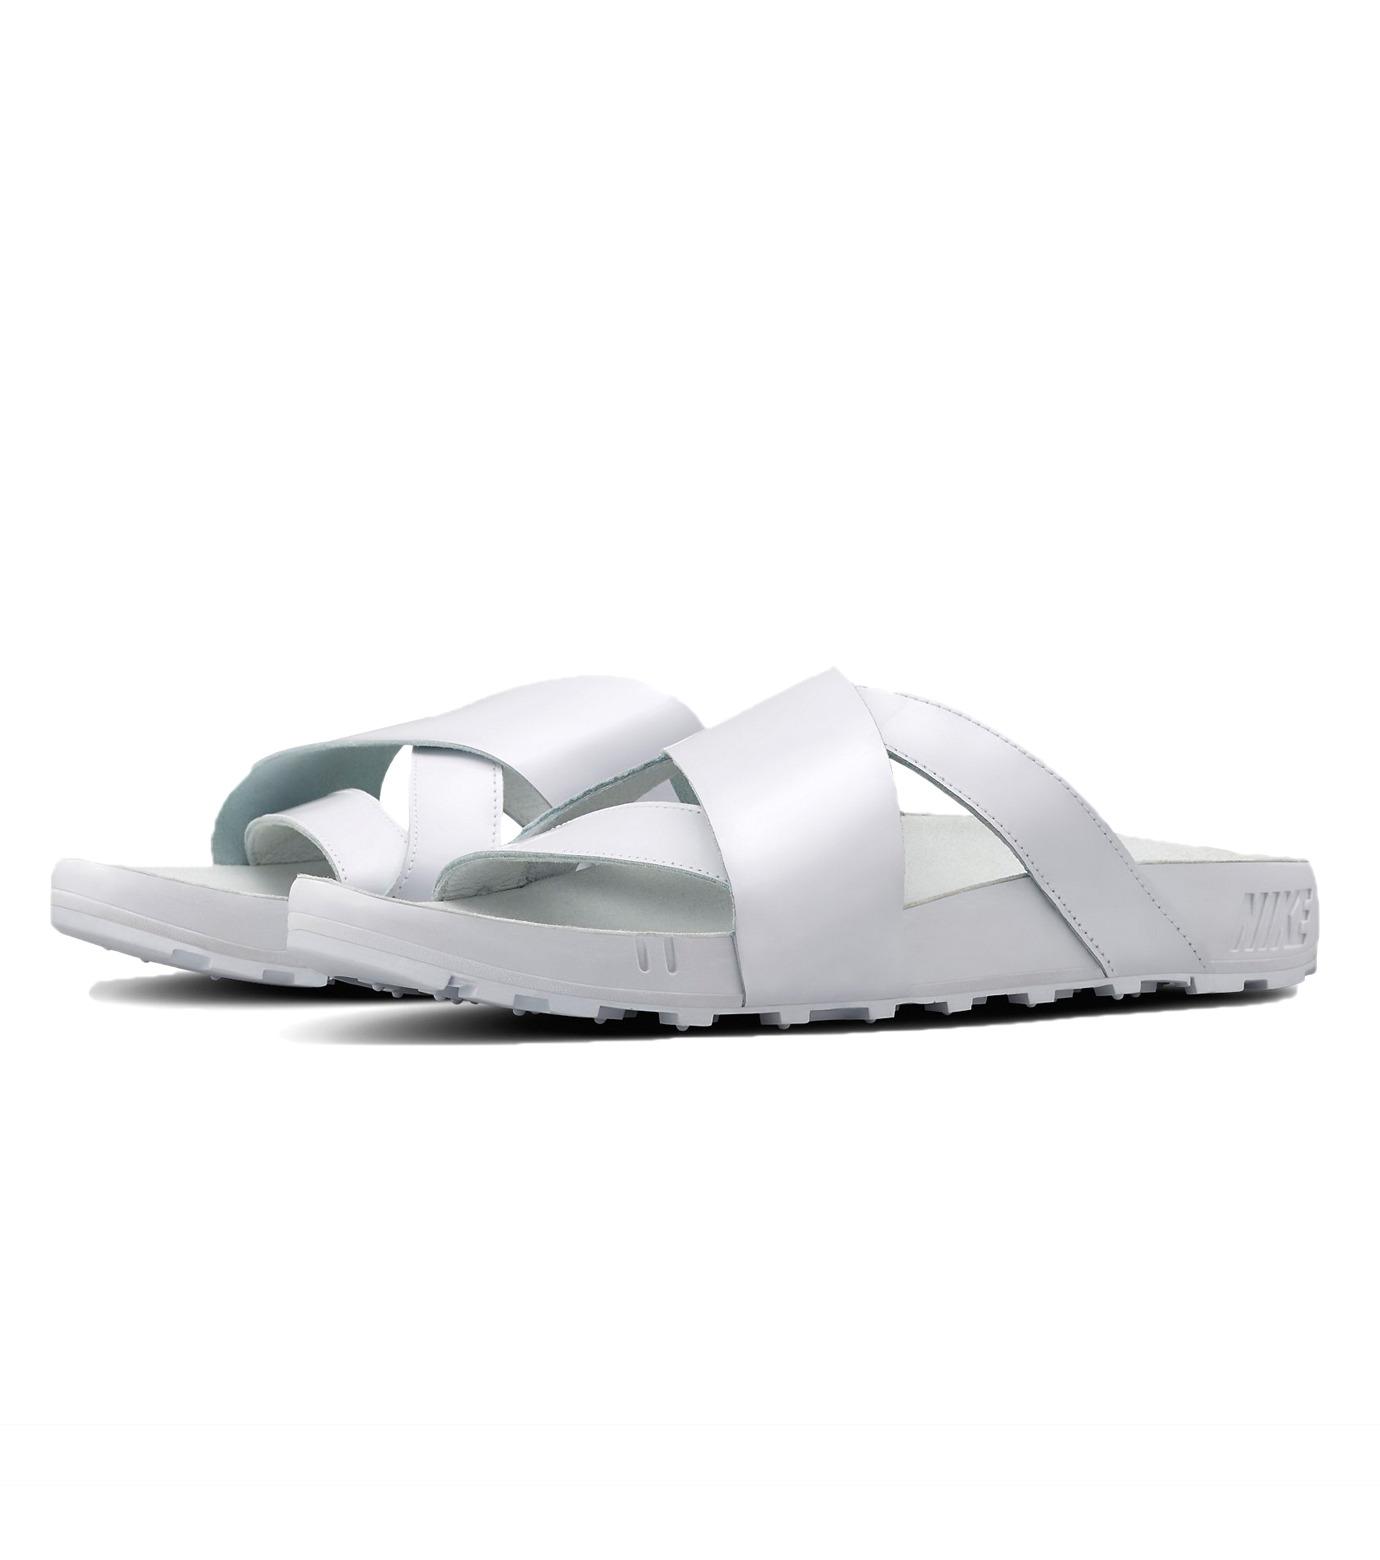 NIKE(ナイキ)のTaupo-WHITE(シューズ/shoes)-849756-100-4 拡大詳細画像3